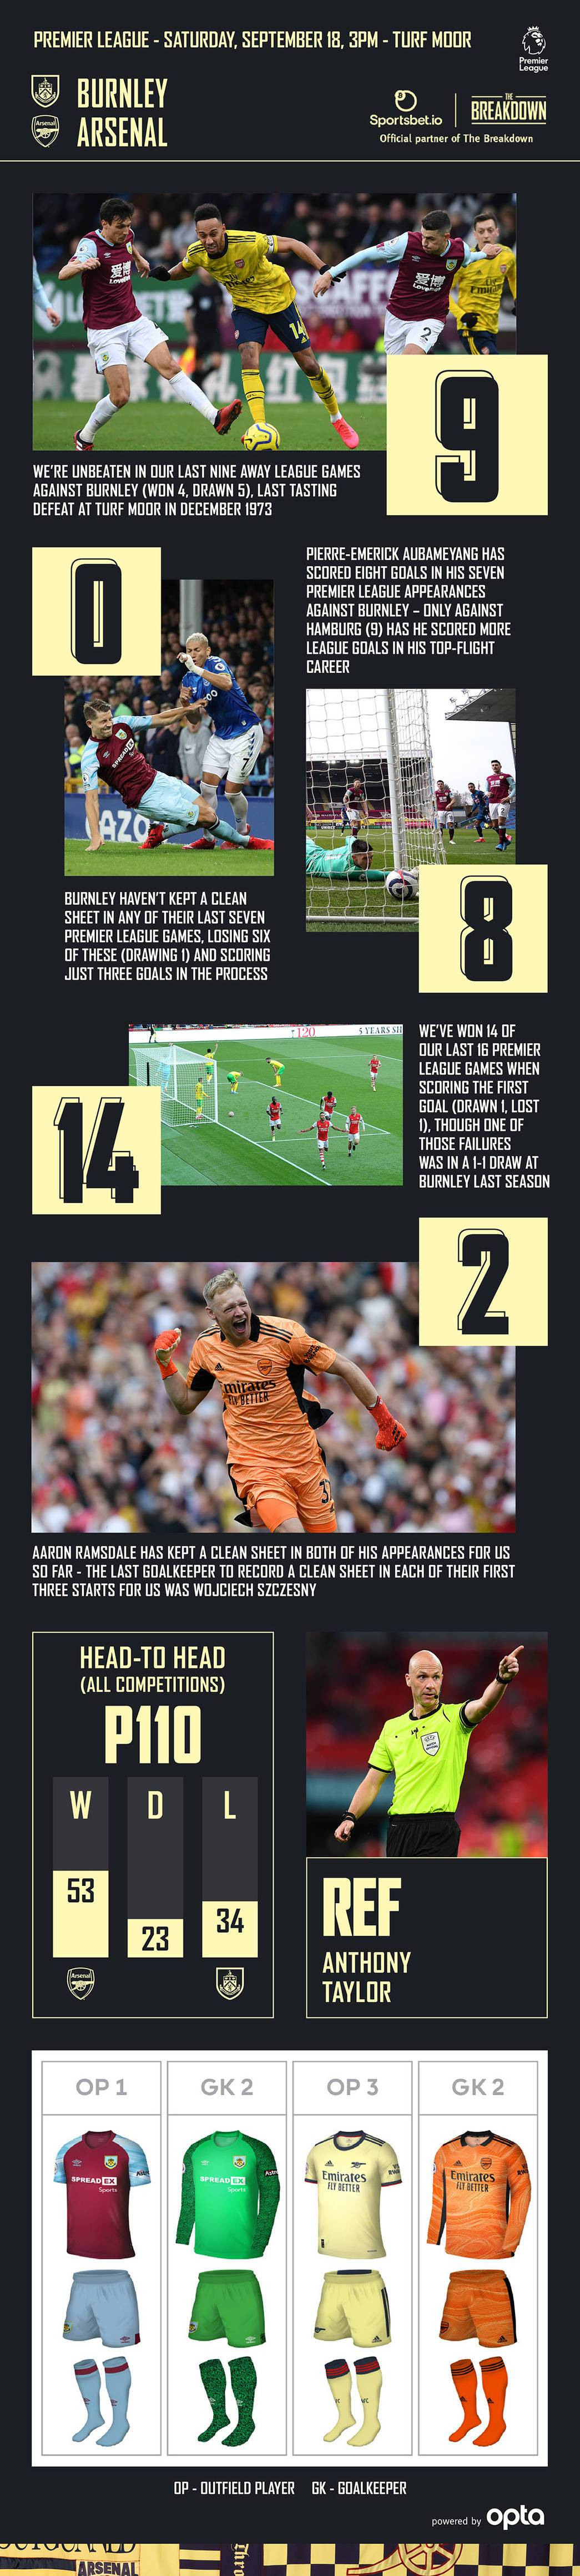 Burnley Vs Arsenal Breakdown